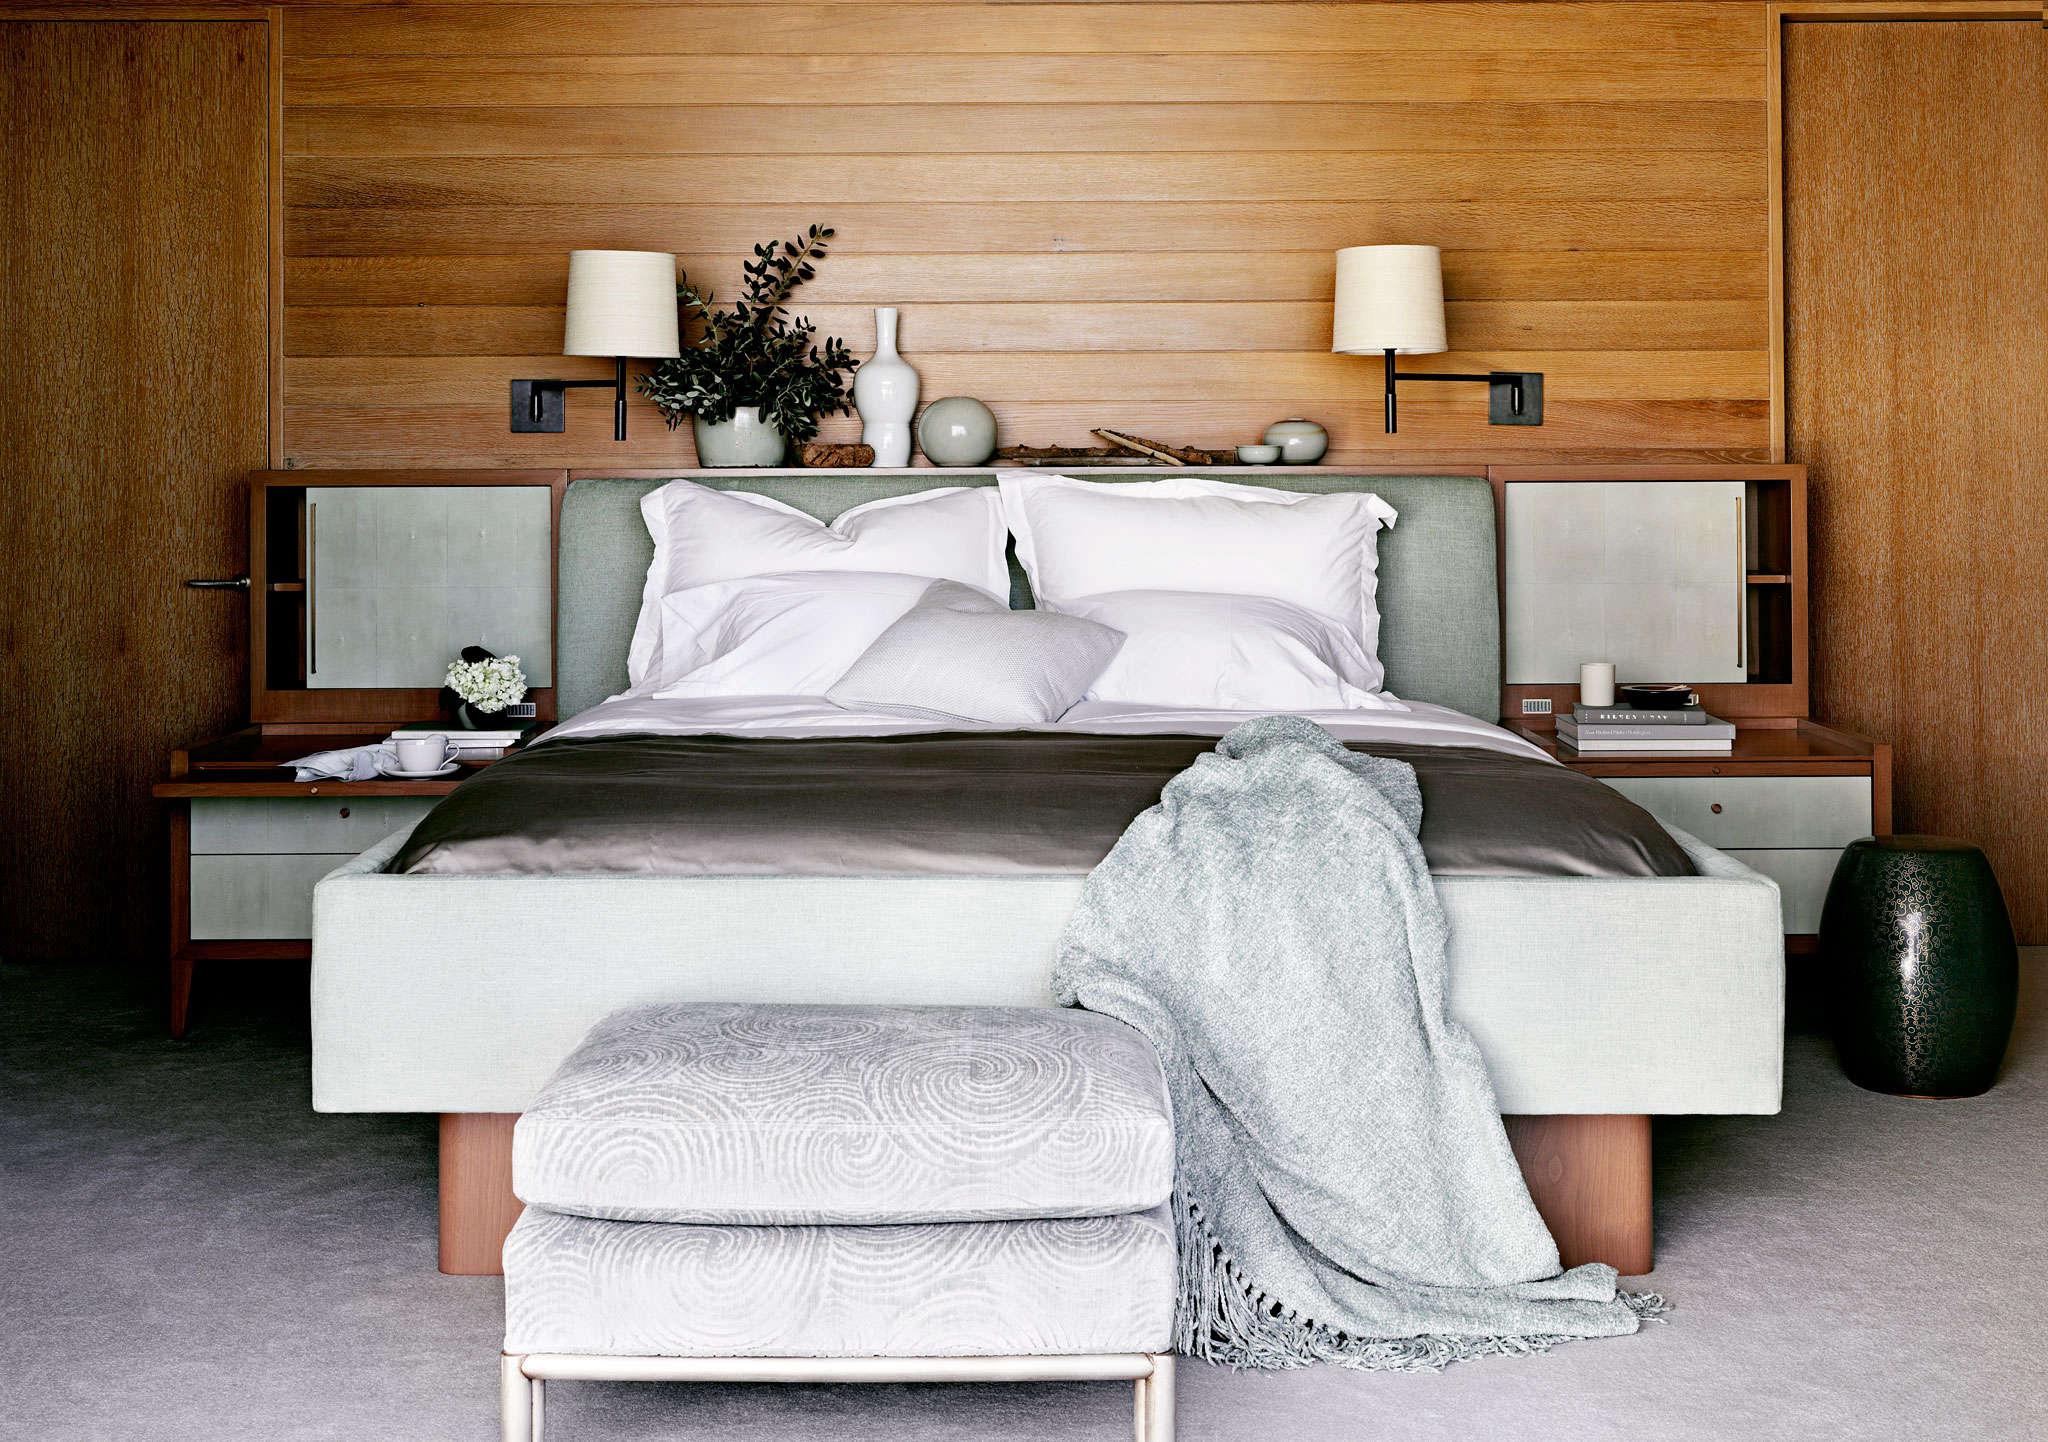 Wood paneled romantic bedroom designed by Barbara Barry | Remodelista